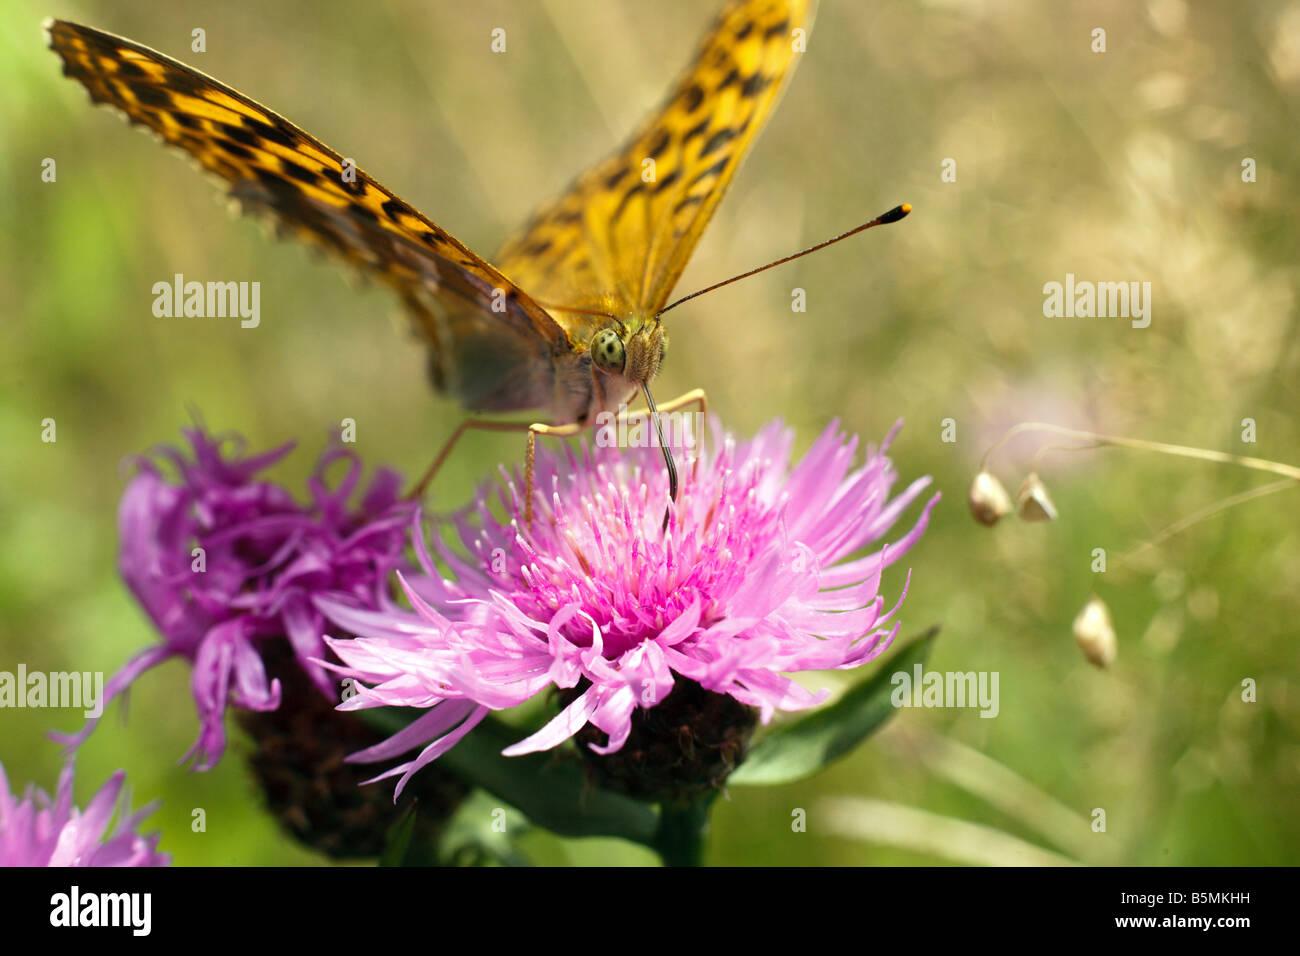 butetfly Argynnis paphia (Silver washed Fritillary) gathering nectar on centaurea jacea flower. - Stock Image